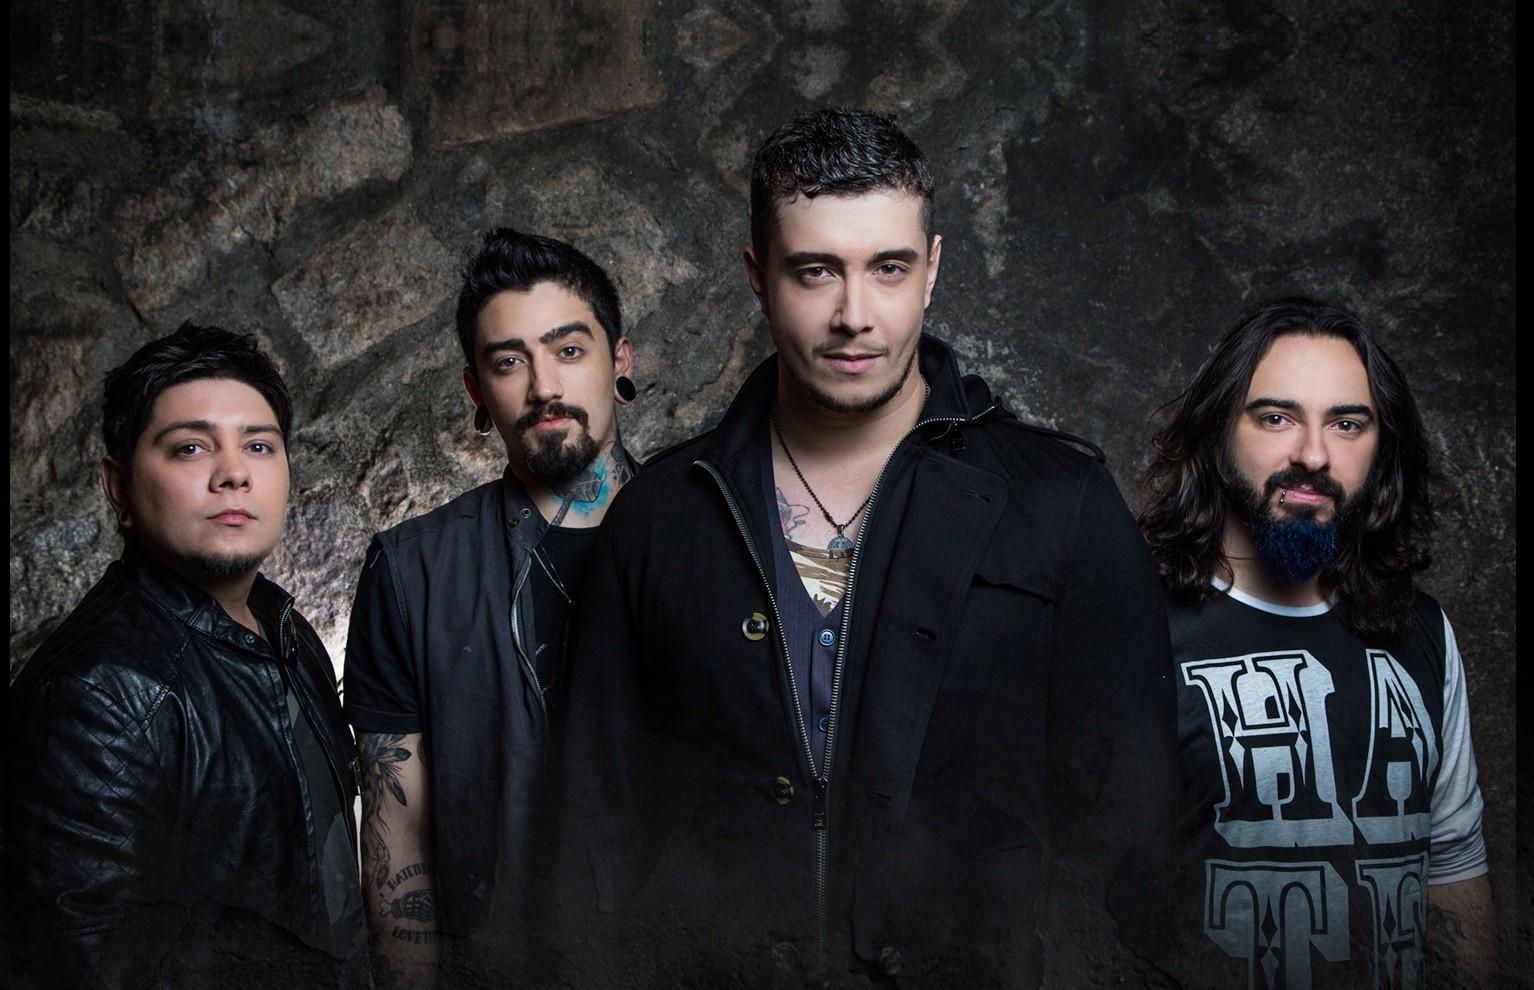 Bruno Boncini deixa a banda Malta para seguir carreira solo (Foto: Divulgao)